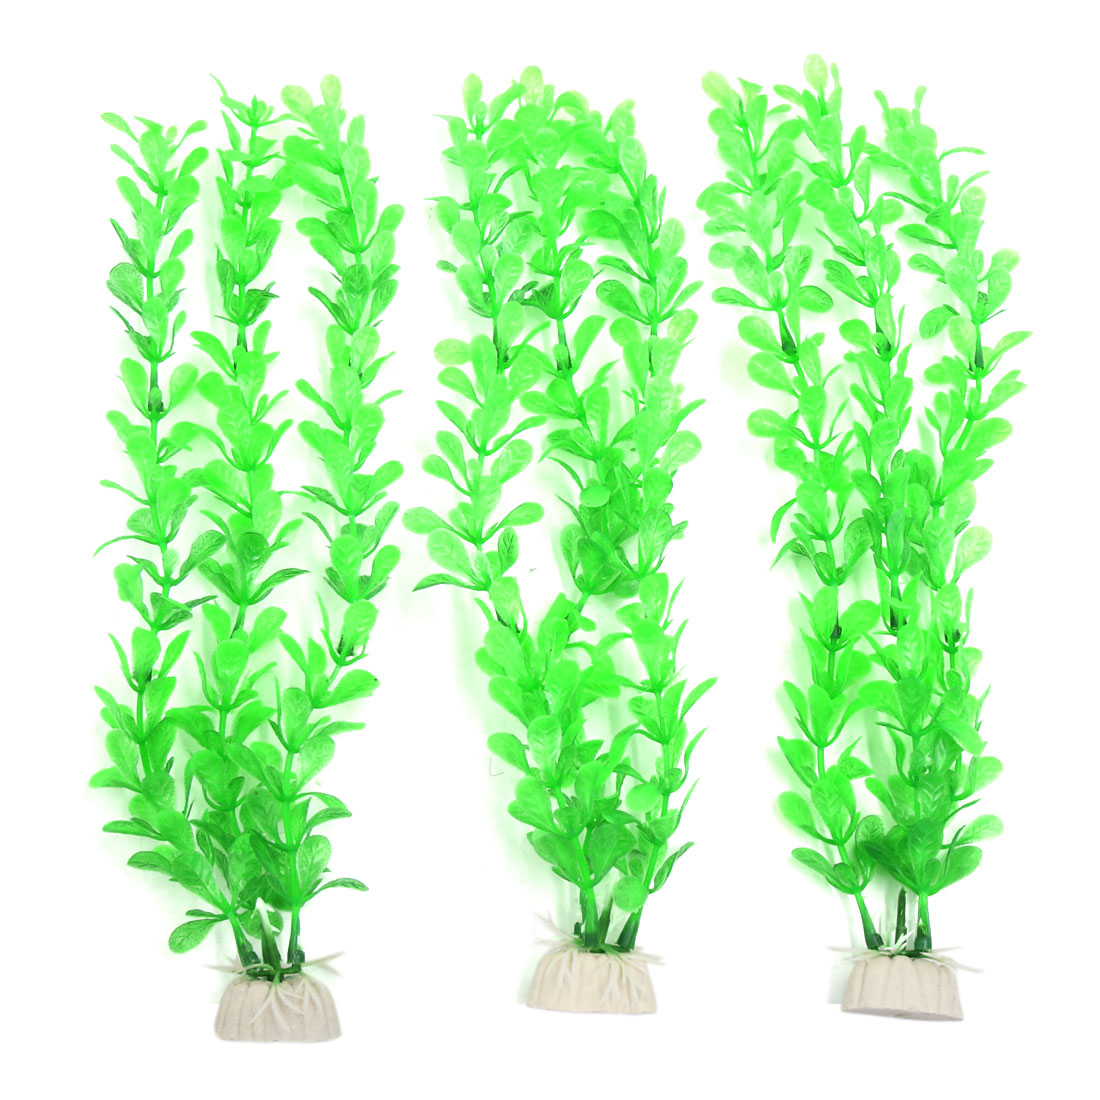 3pcs Green Plastic Aquarium Fish Tank Water Grass Plant Decorative Landscape